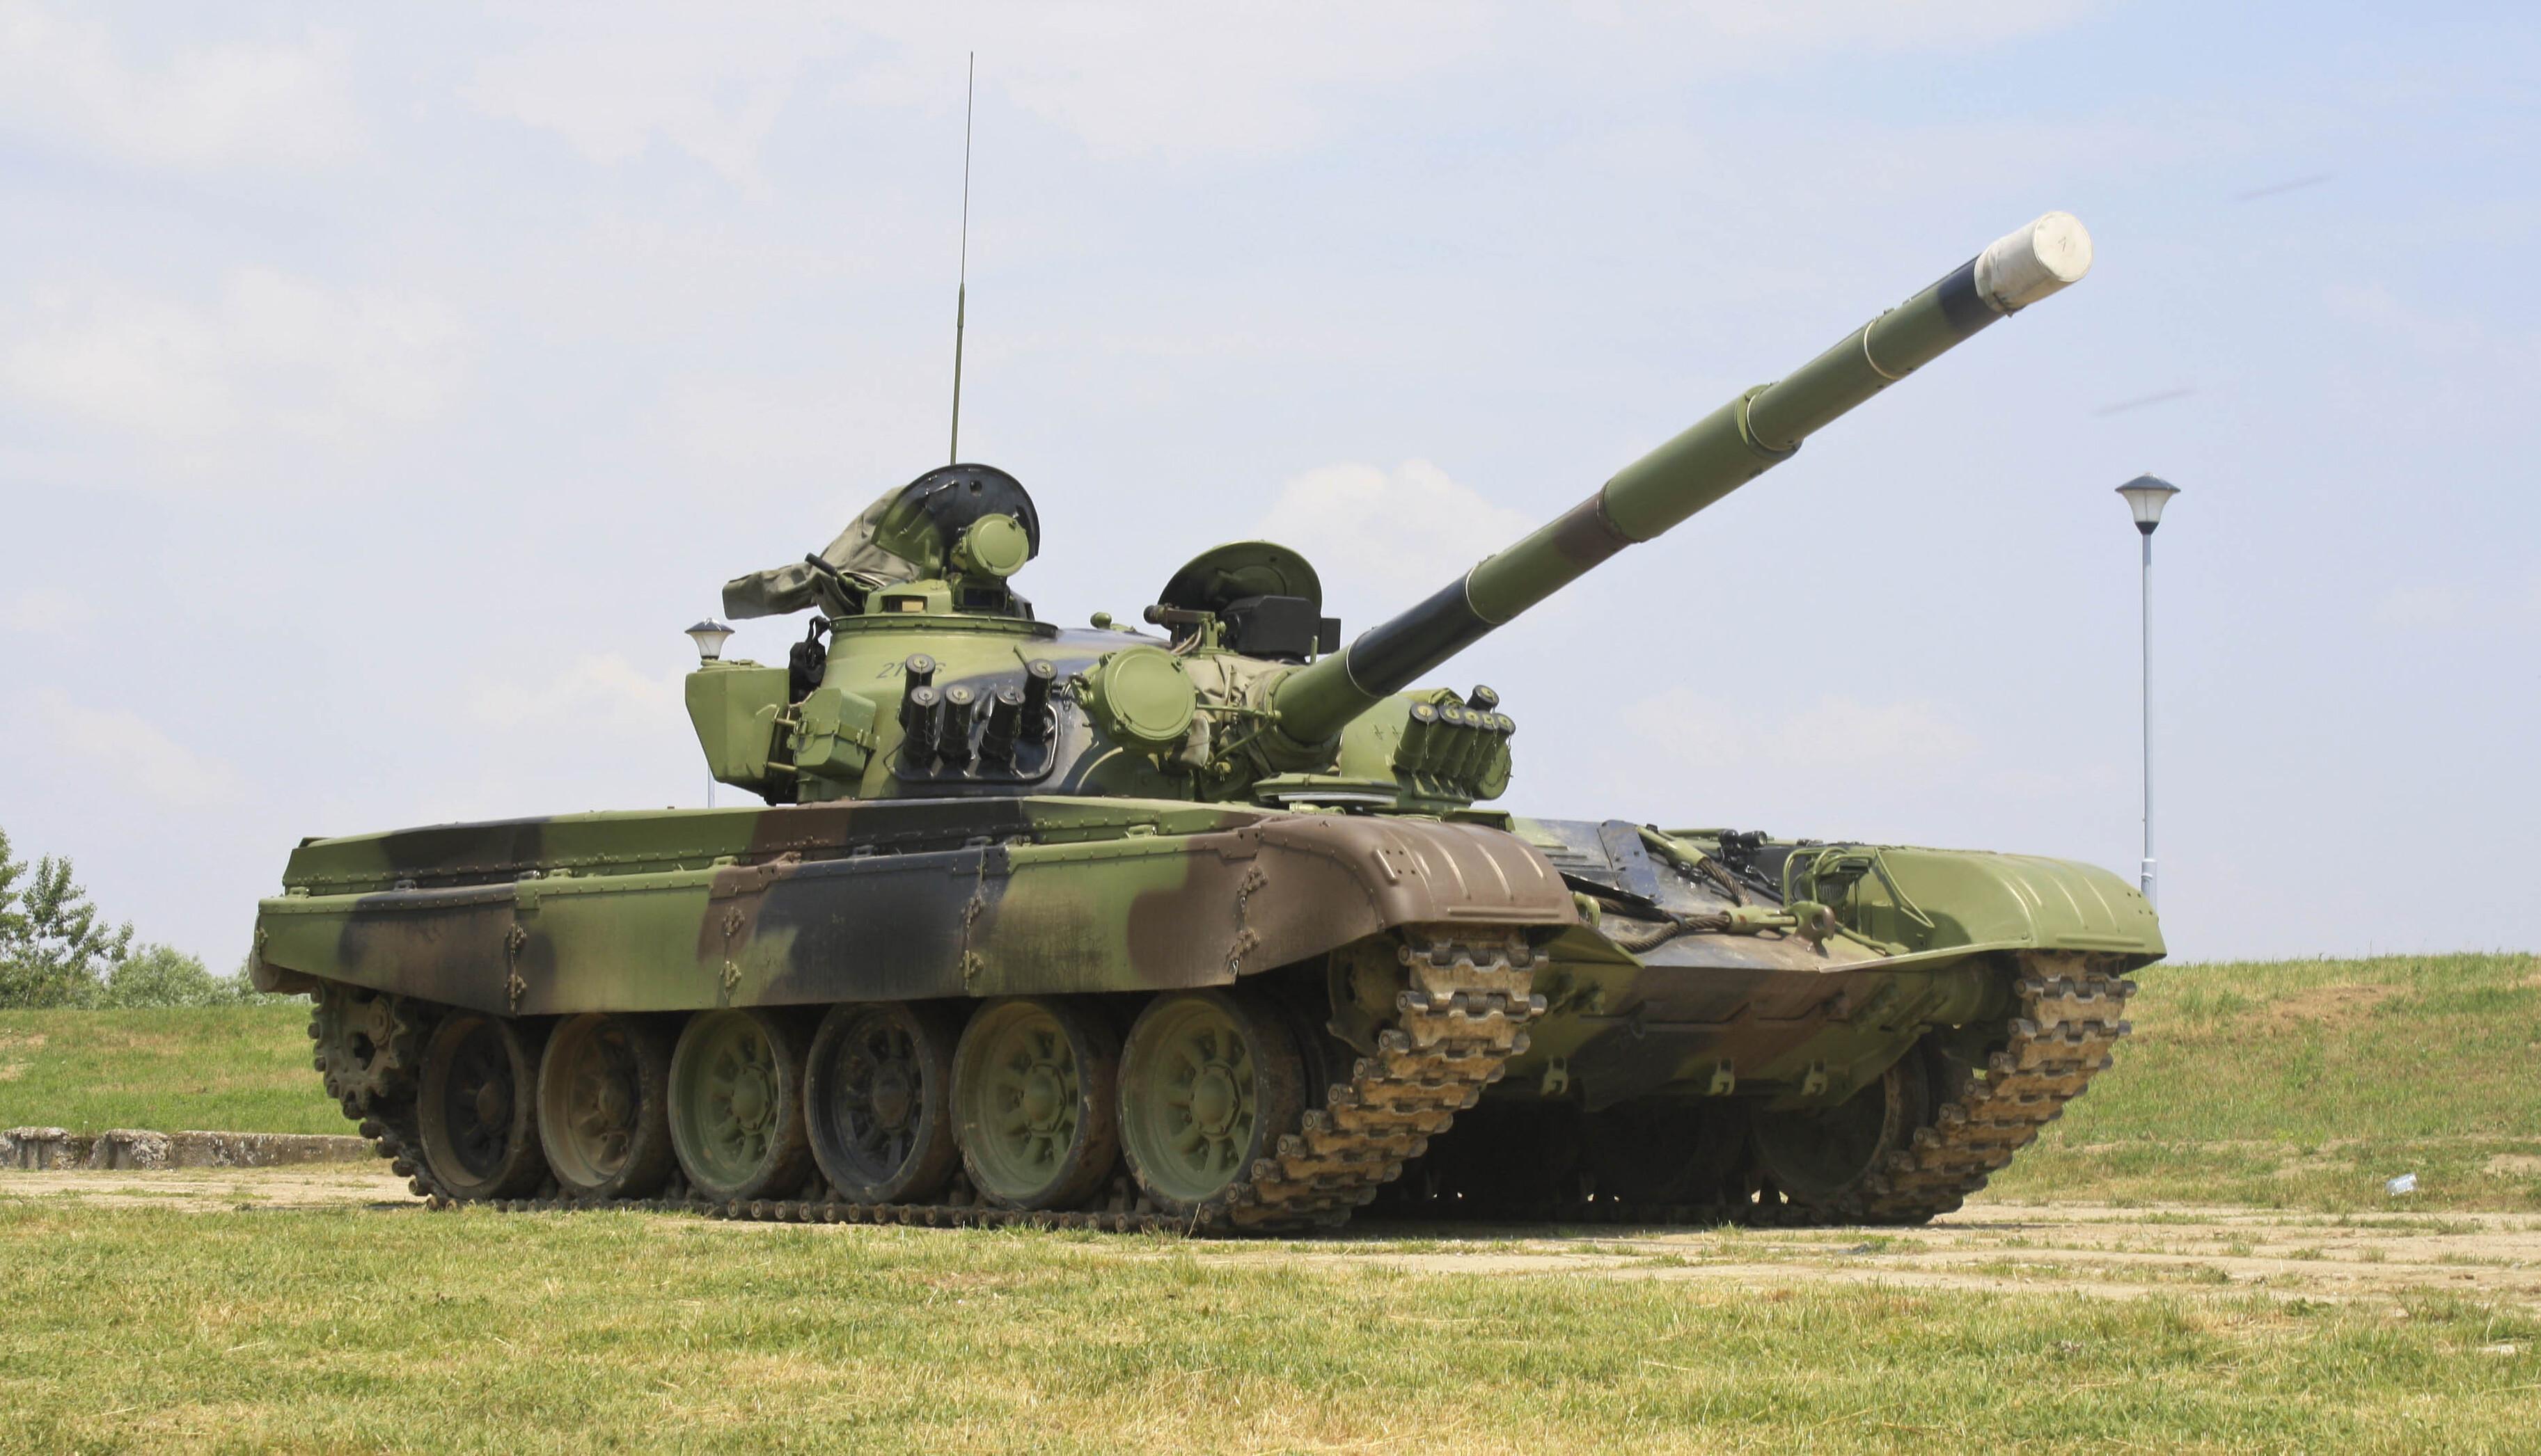 Танк М-84 с «советскими корнями» модернизировали